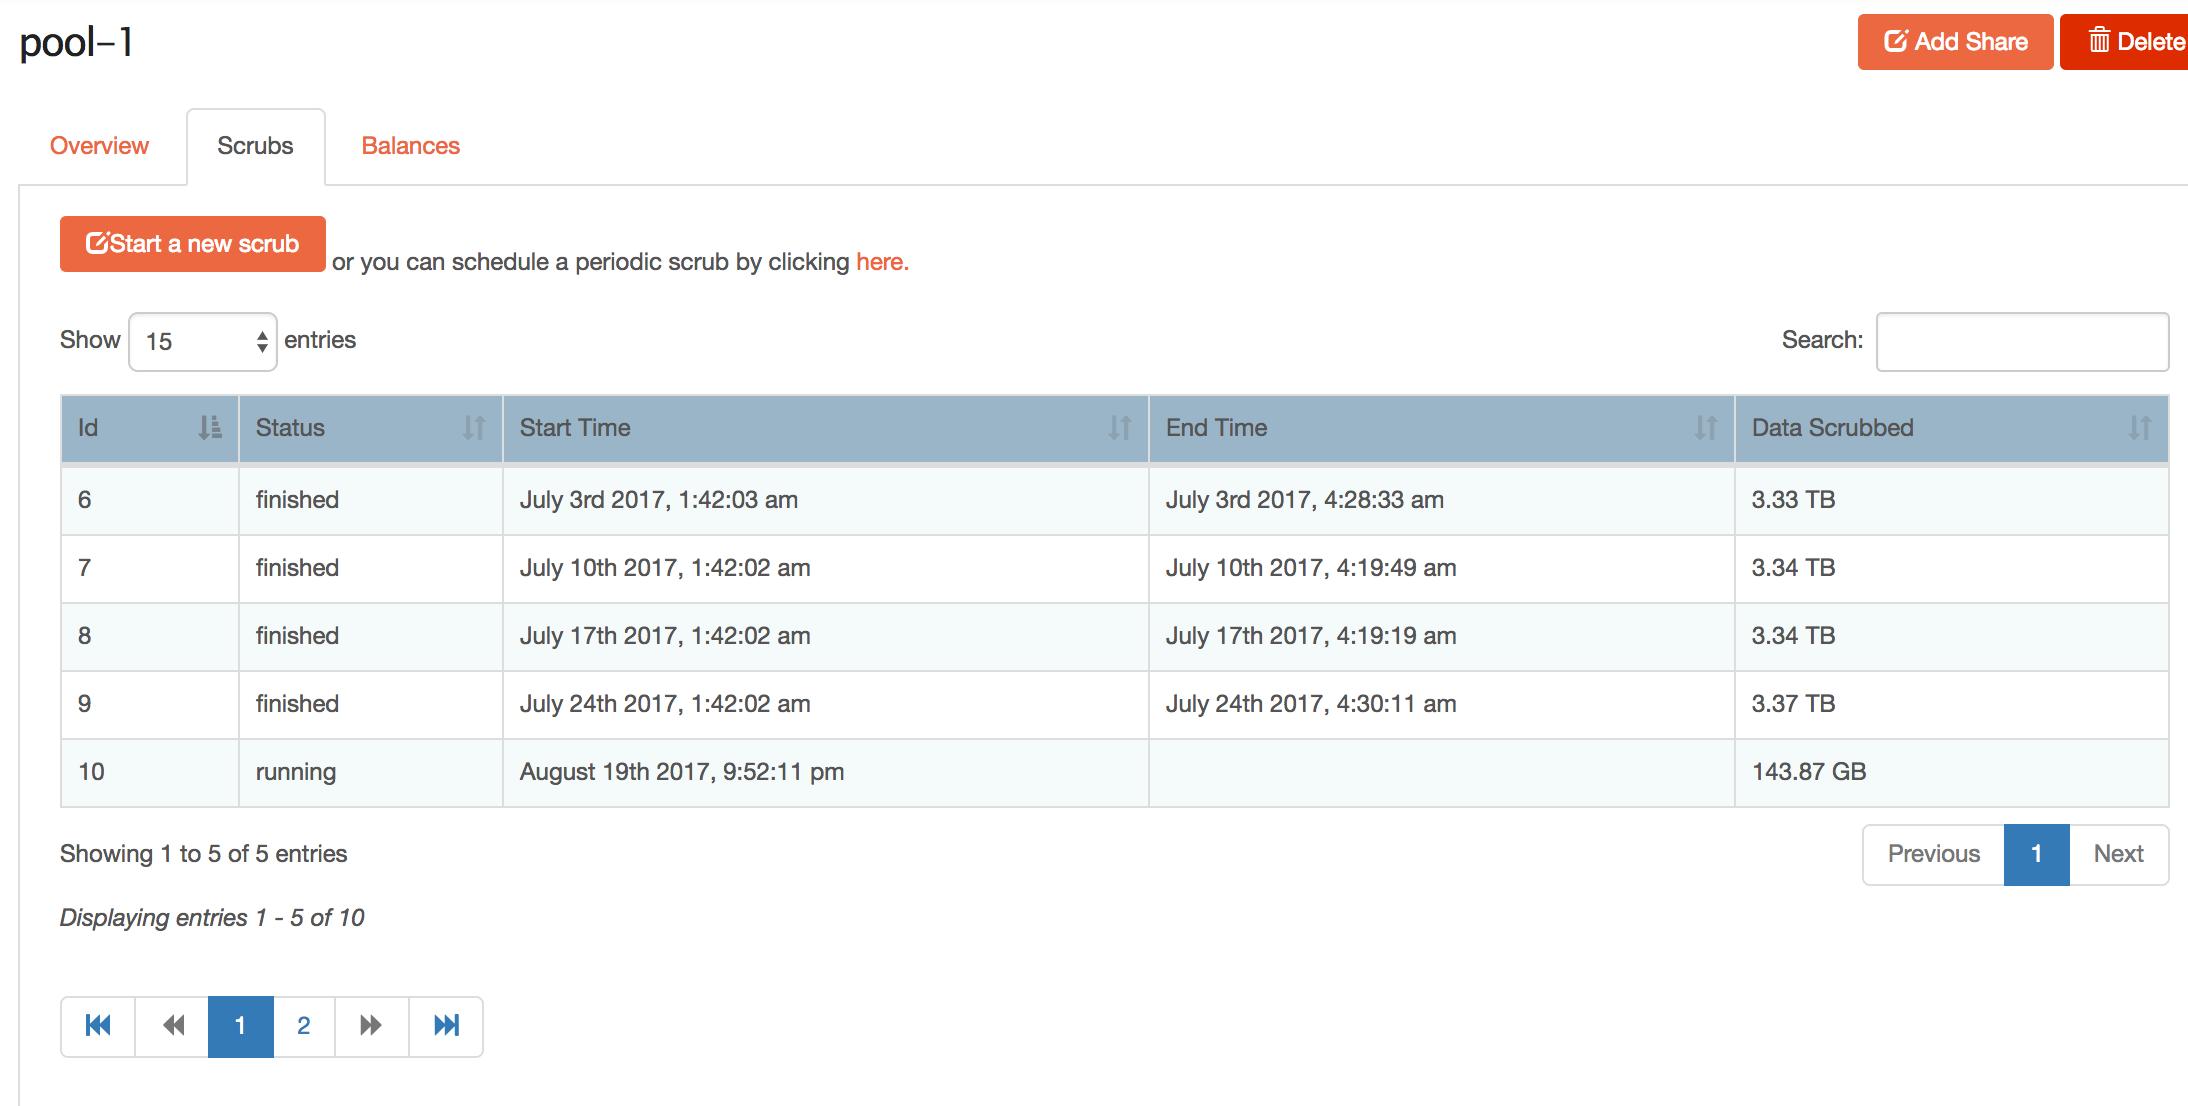 Scheduled Scrub not running - Troubleshooting - Rockstor